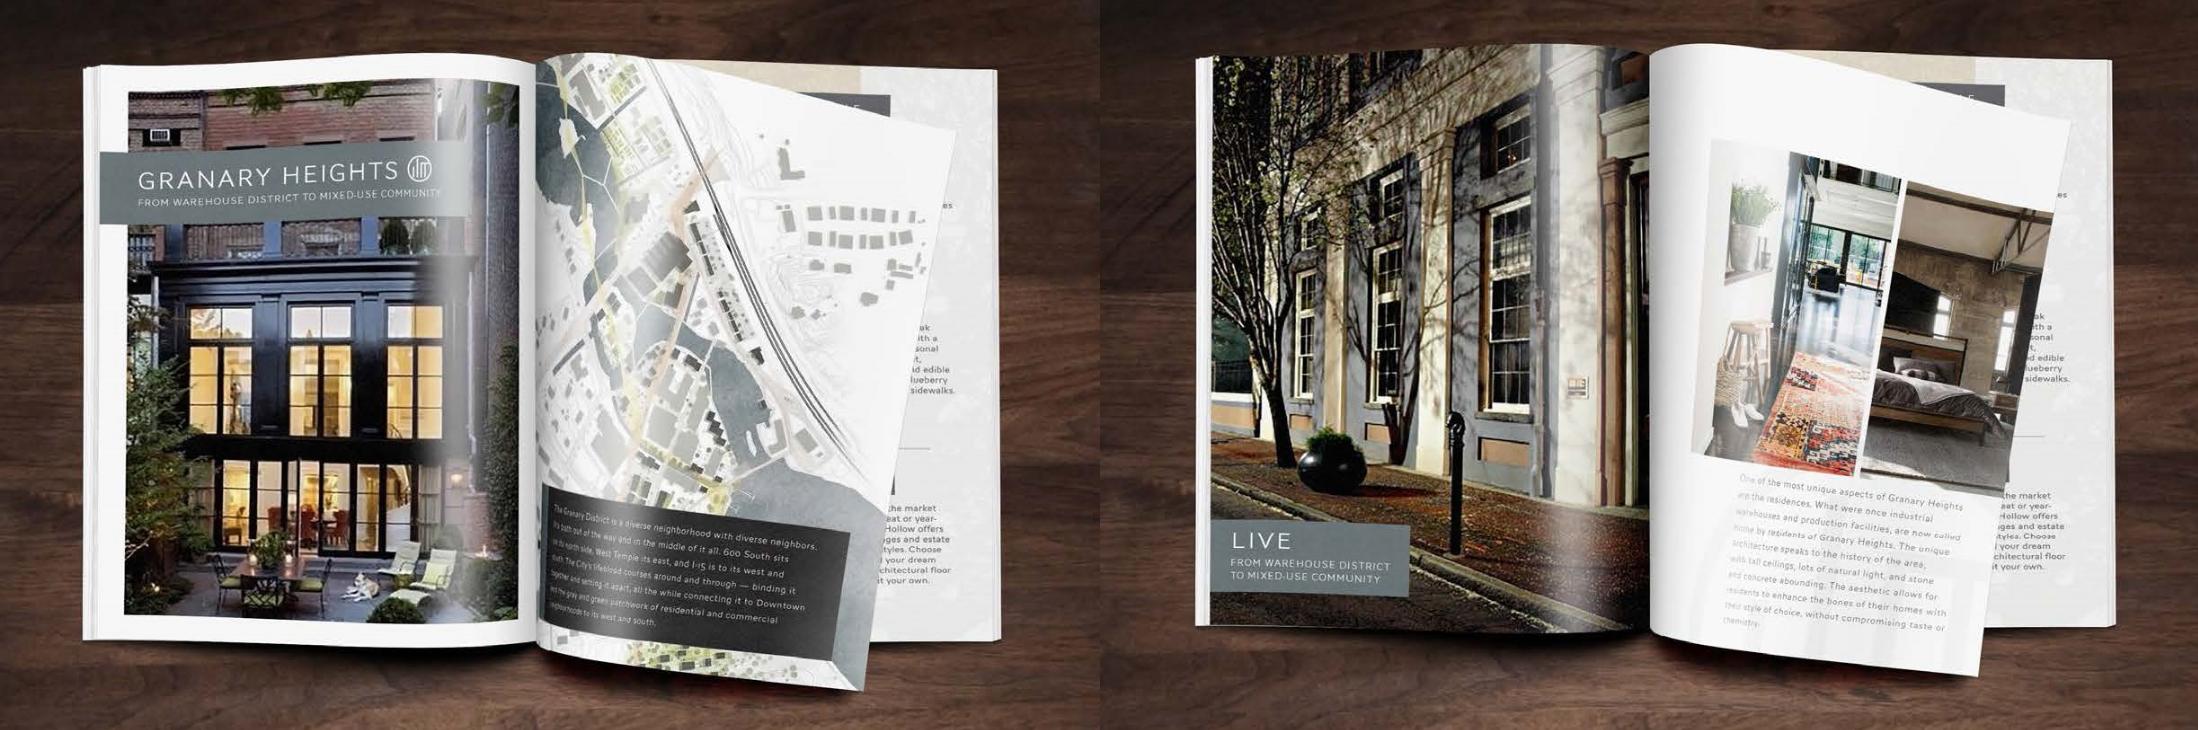 graphic design for realtors salt lake city